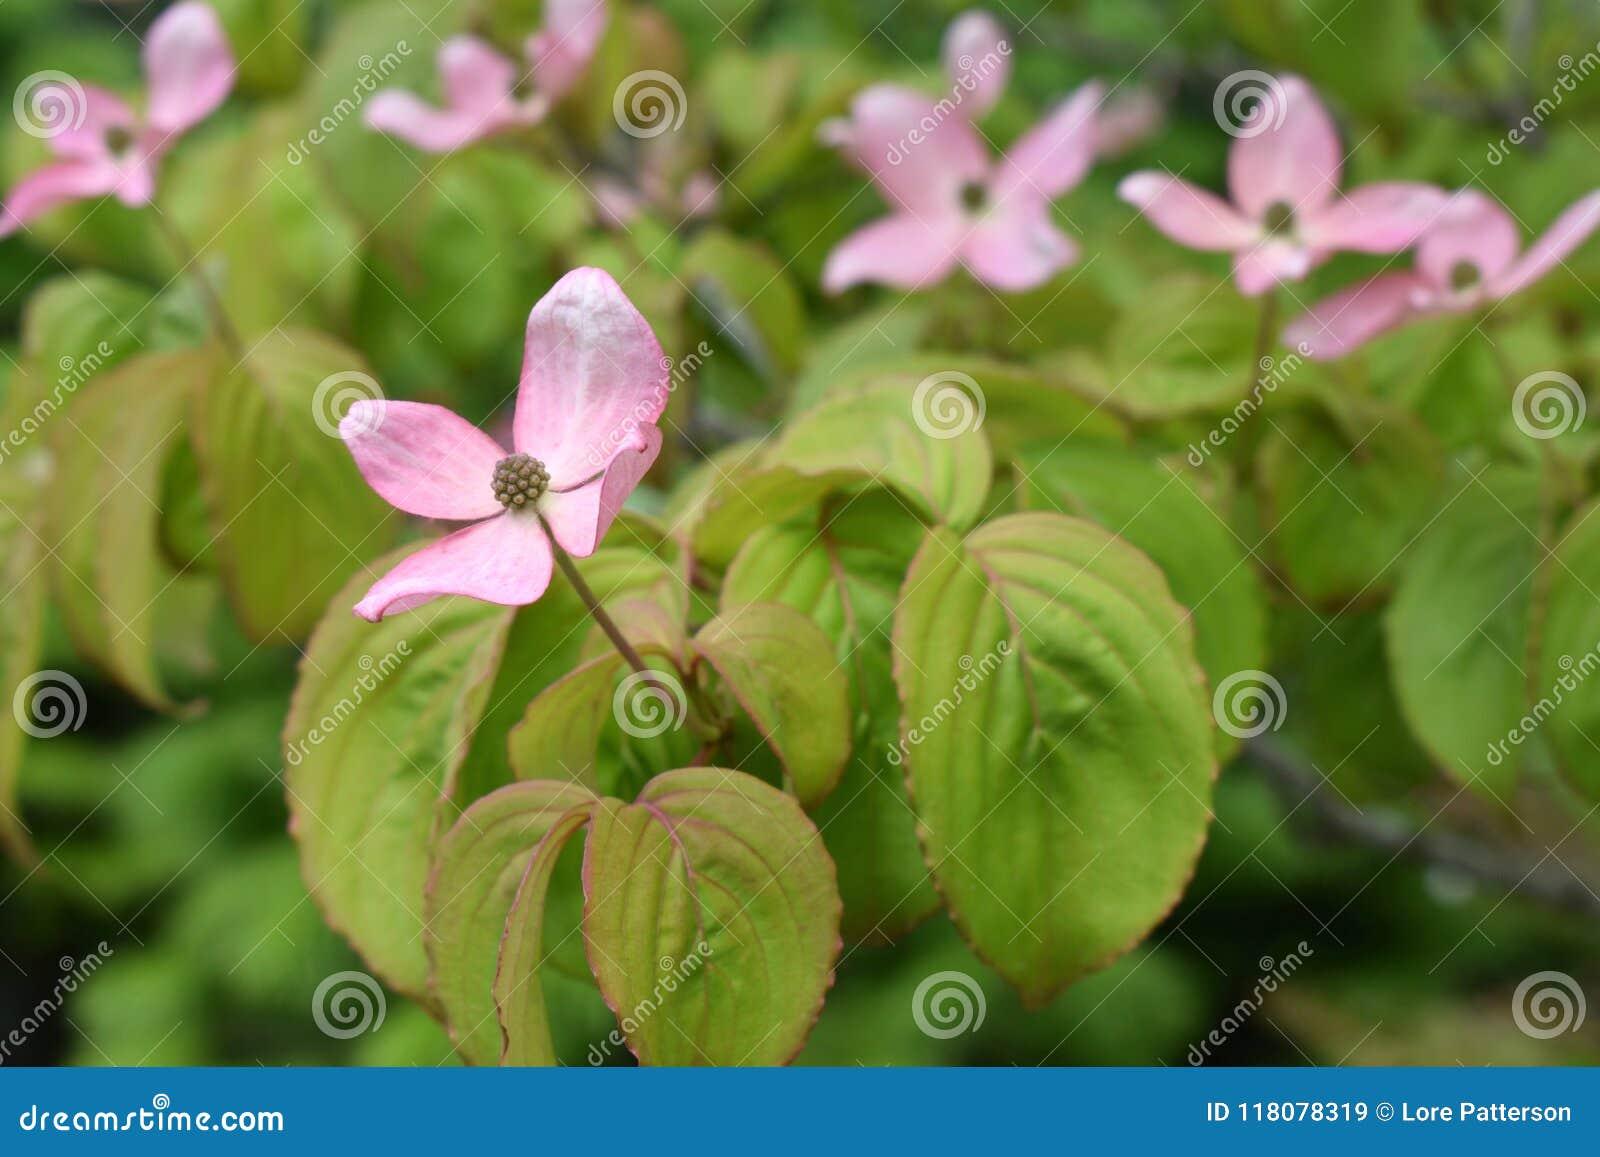 Pink flowering dogwood tree cornus kousa satomi stock image download pink flowering dogwood tree cornus kousa satomi stock image image of horticulture mightylinksfo